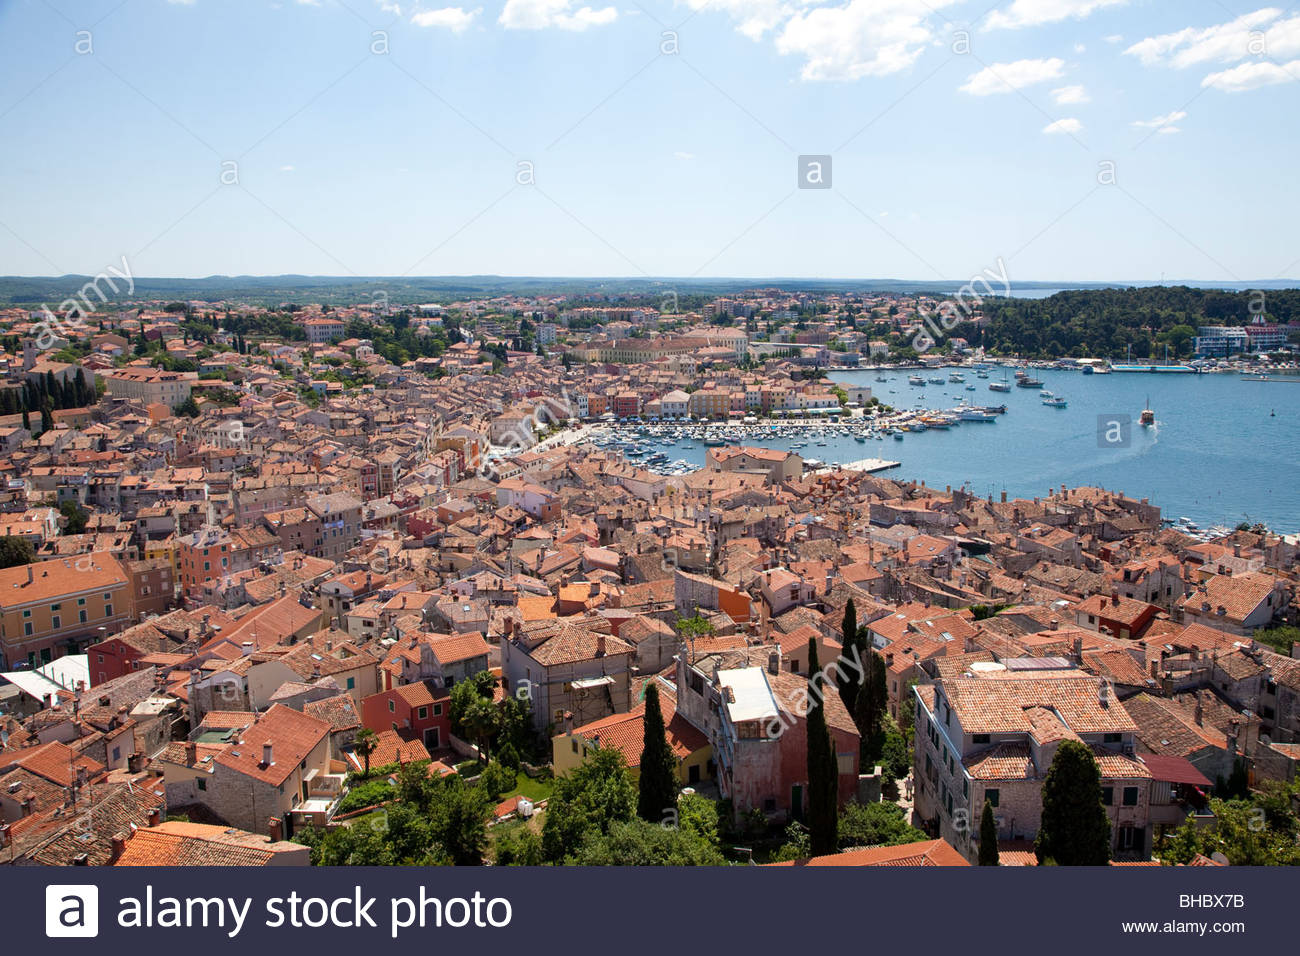 Croatia croatian Europe European Istria Mediterranean old overview roof roofs rooftop rooftops Rovinj town - Stock Image